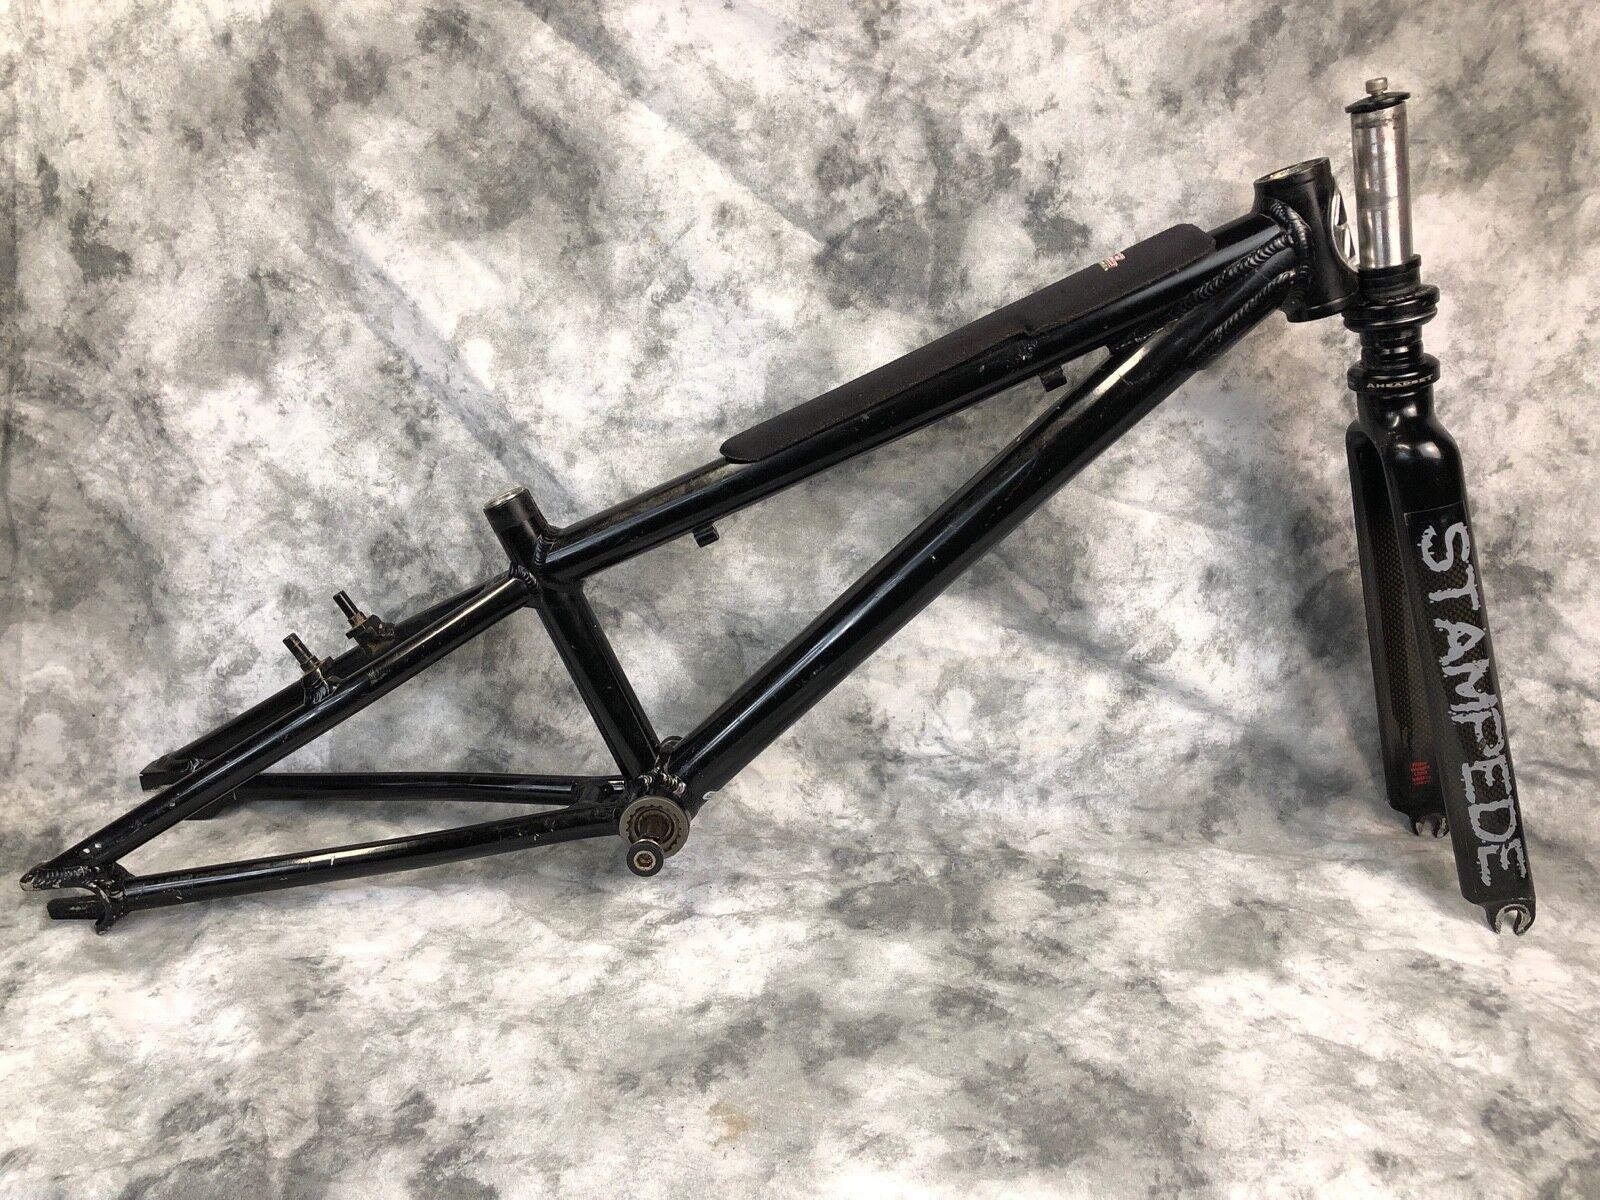 rojoline Micro Cuadro para Bicicleta De Carrera De De De Aluminio Mini y Stampede Horquilla de fibra de carbono 7e430d